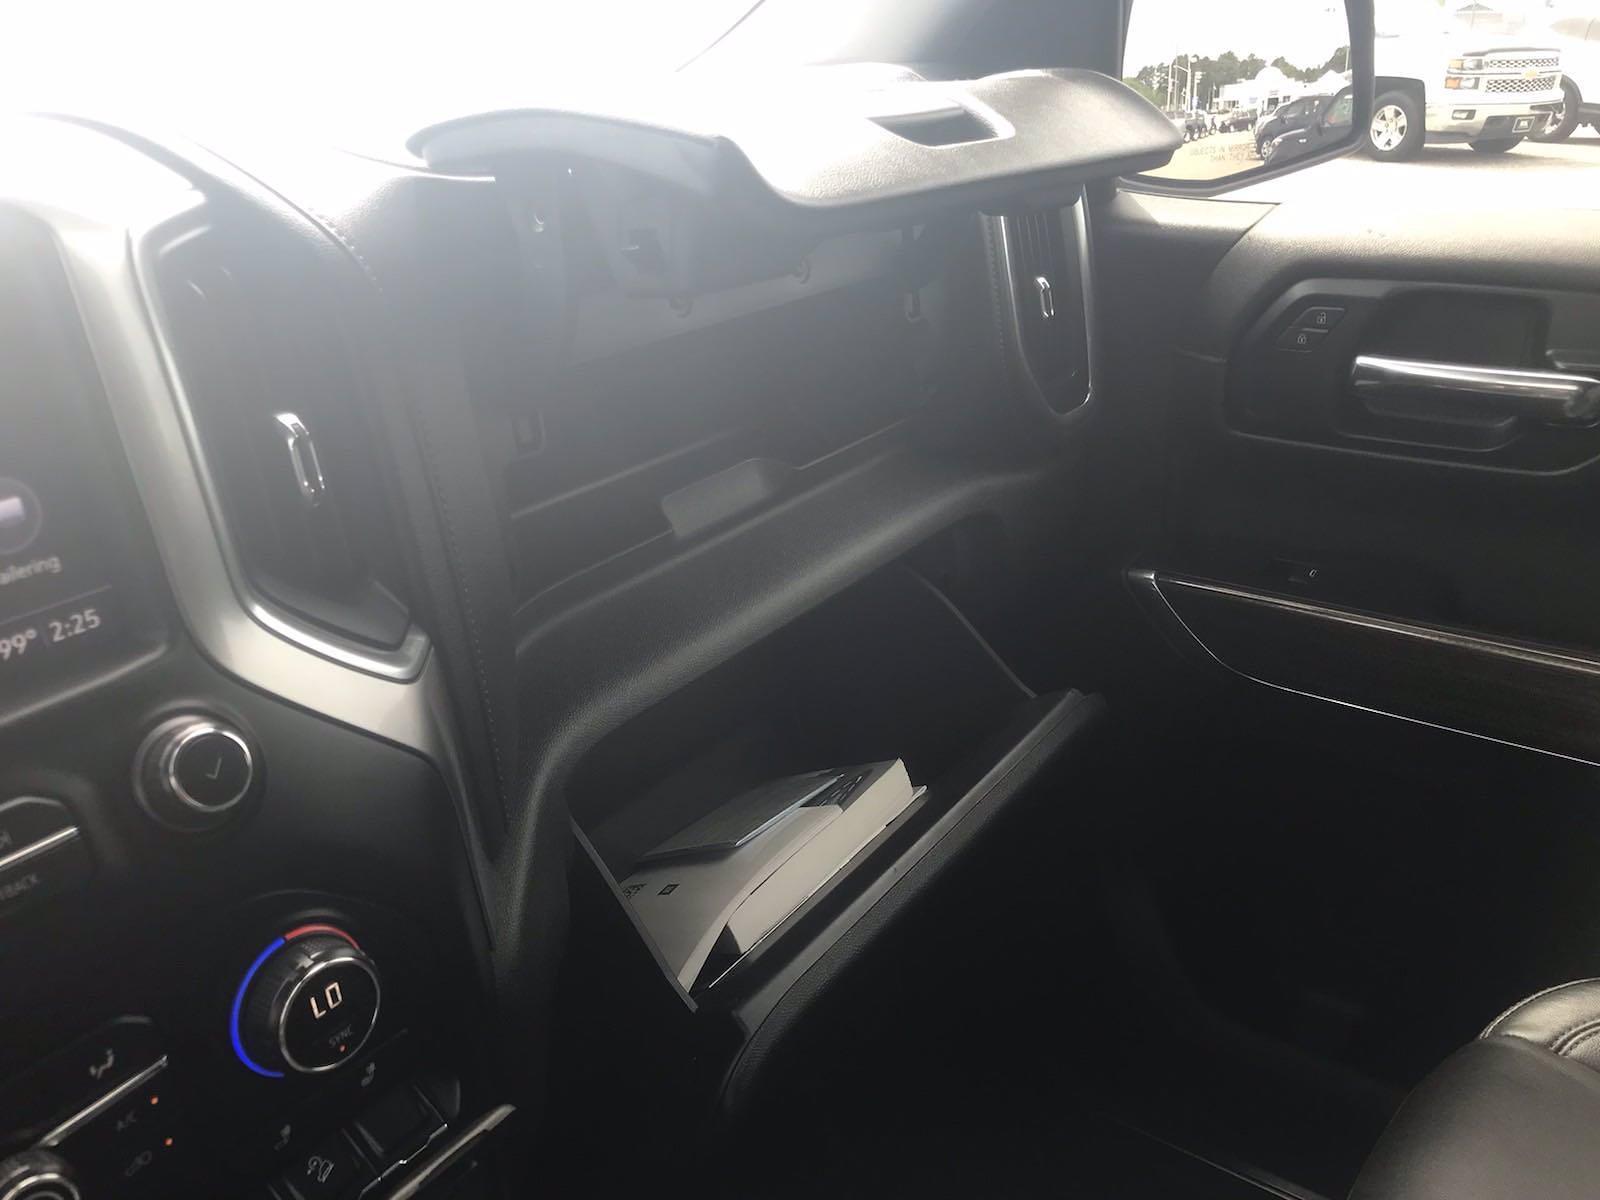 2019 Chevrolet Silverado 1500 Crew Cab 4x4, Pickup #16609P - photo 42